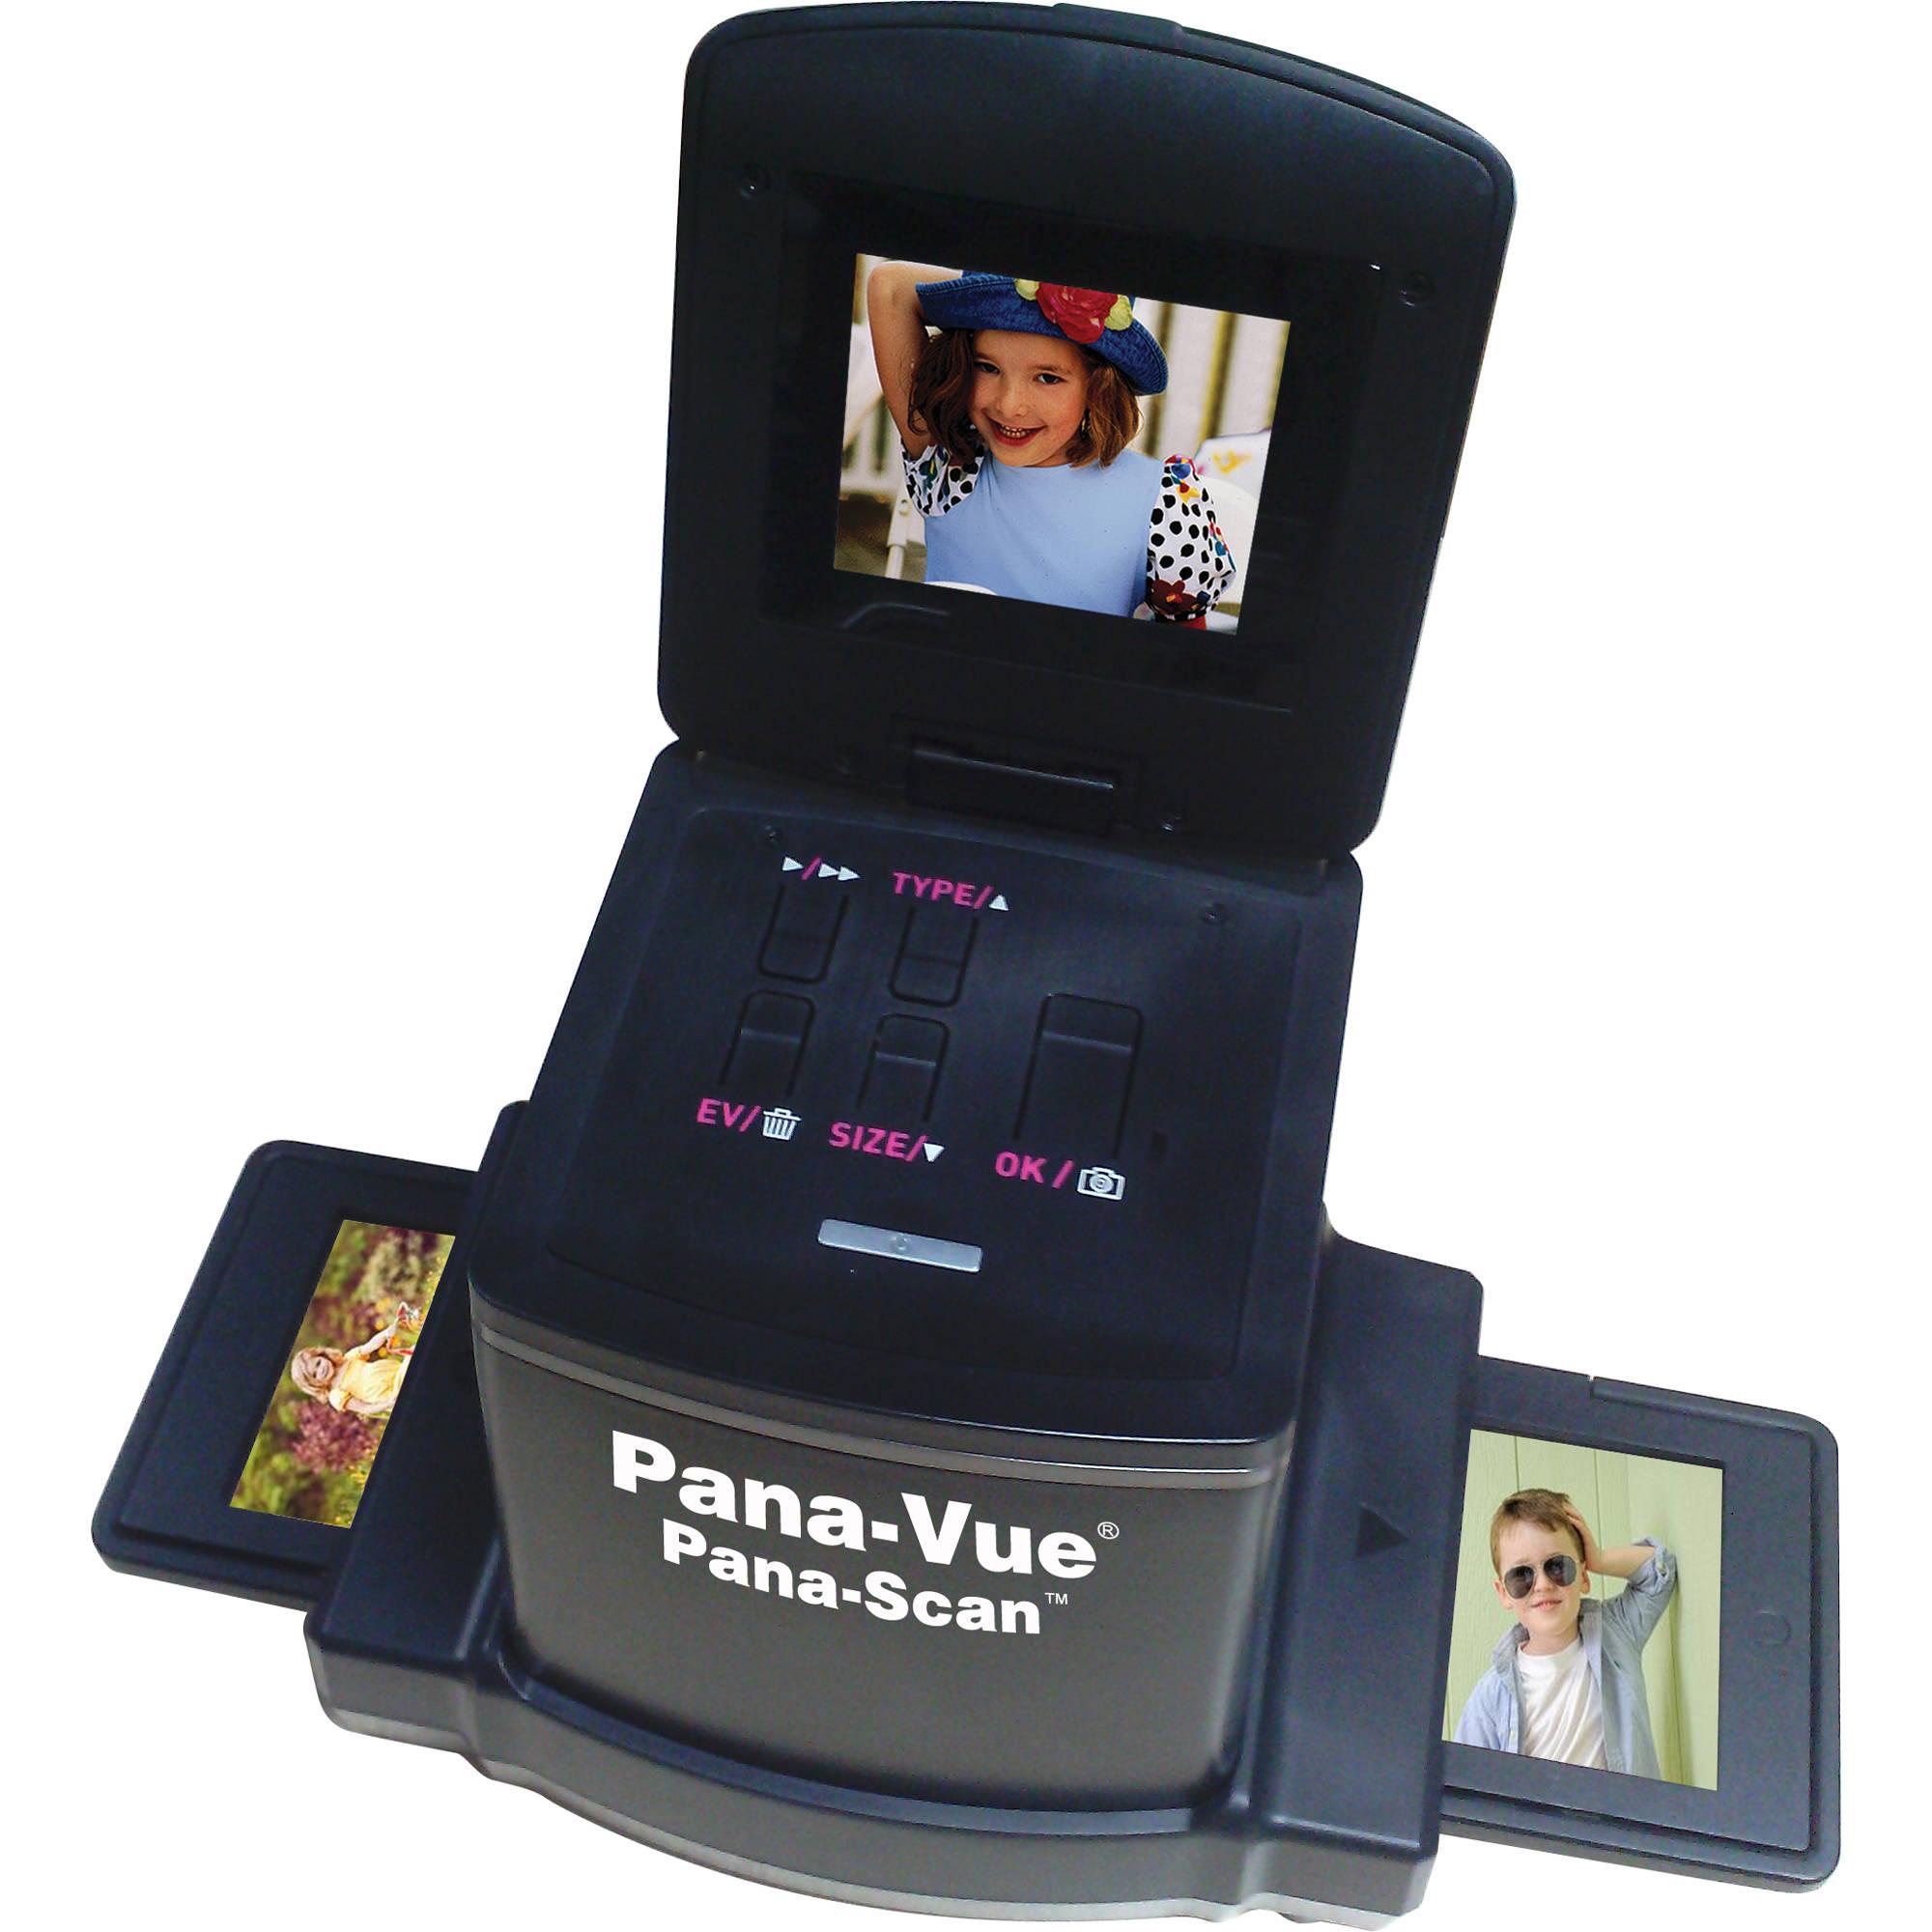 Pana-Vue Pana-Scan 120 Transparency & Film Scanner